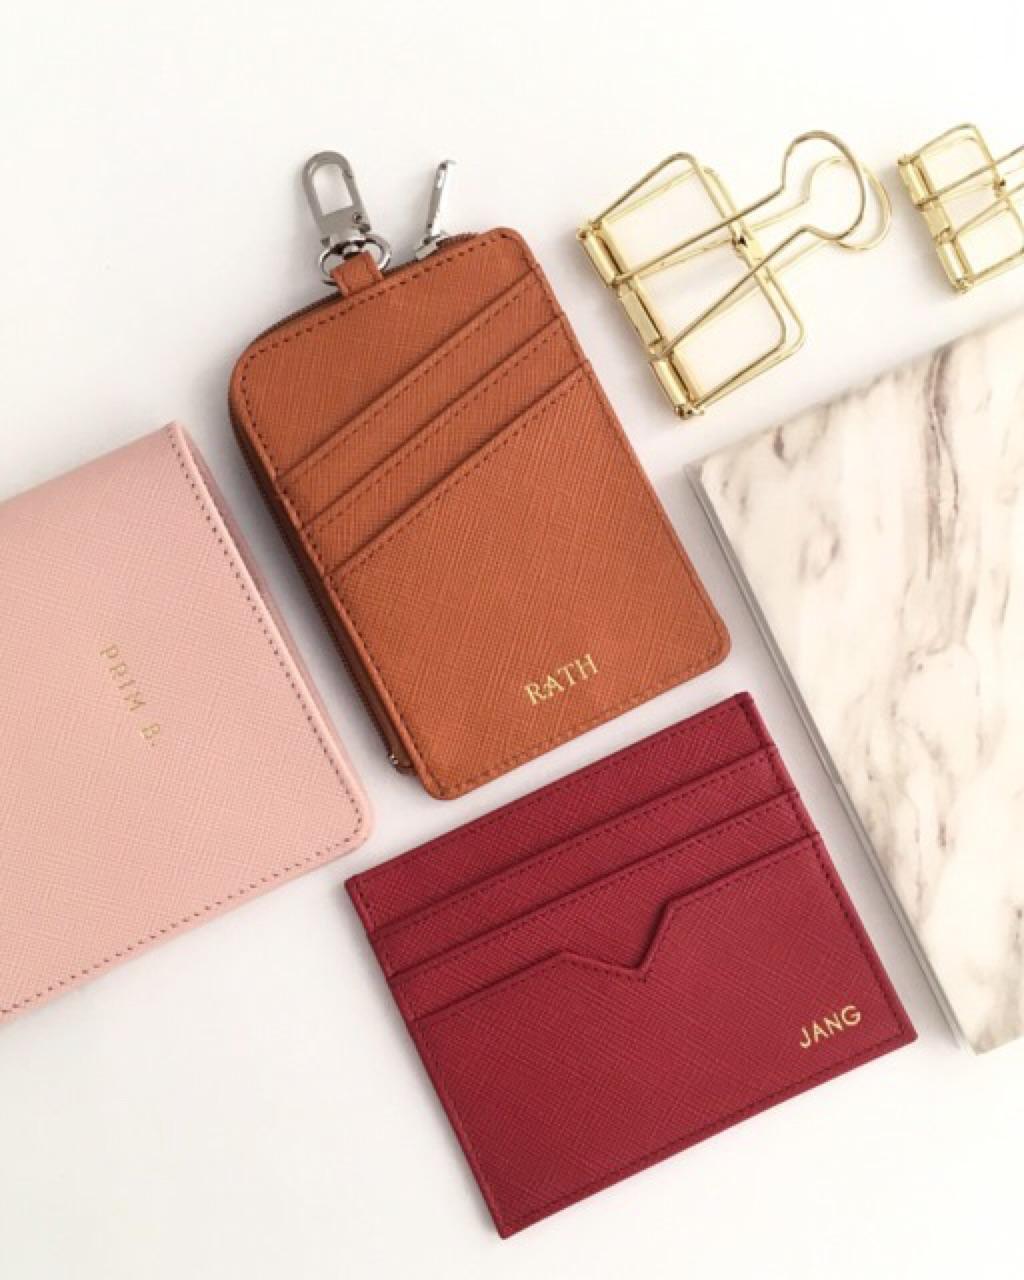 VITTCUSTOMSTUDIO,กระเป๋า,กระเป๋าหนัง,ซอง,ซองหนัง,ซองใส่บัตร,ใส่บัตร